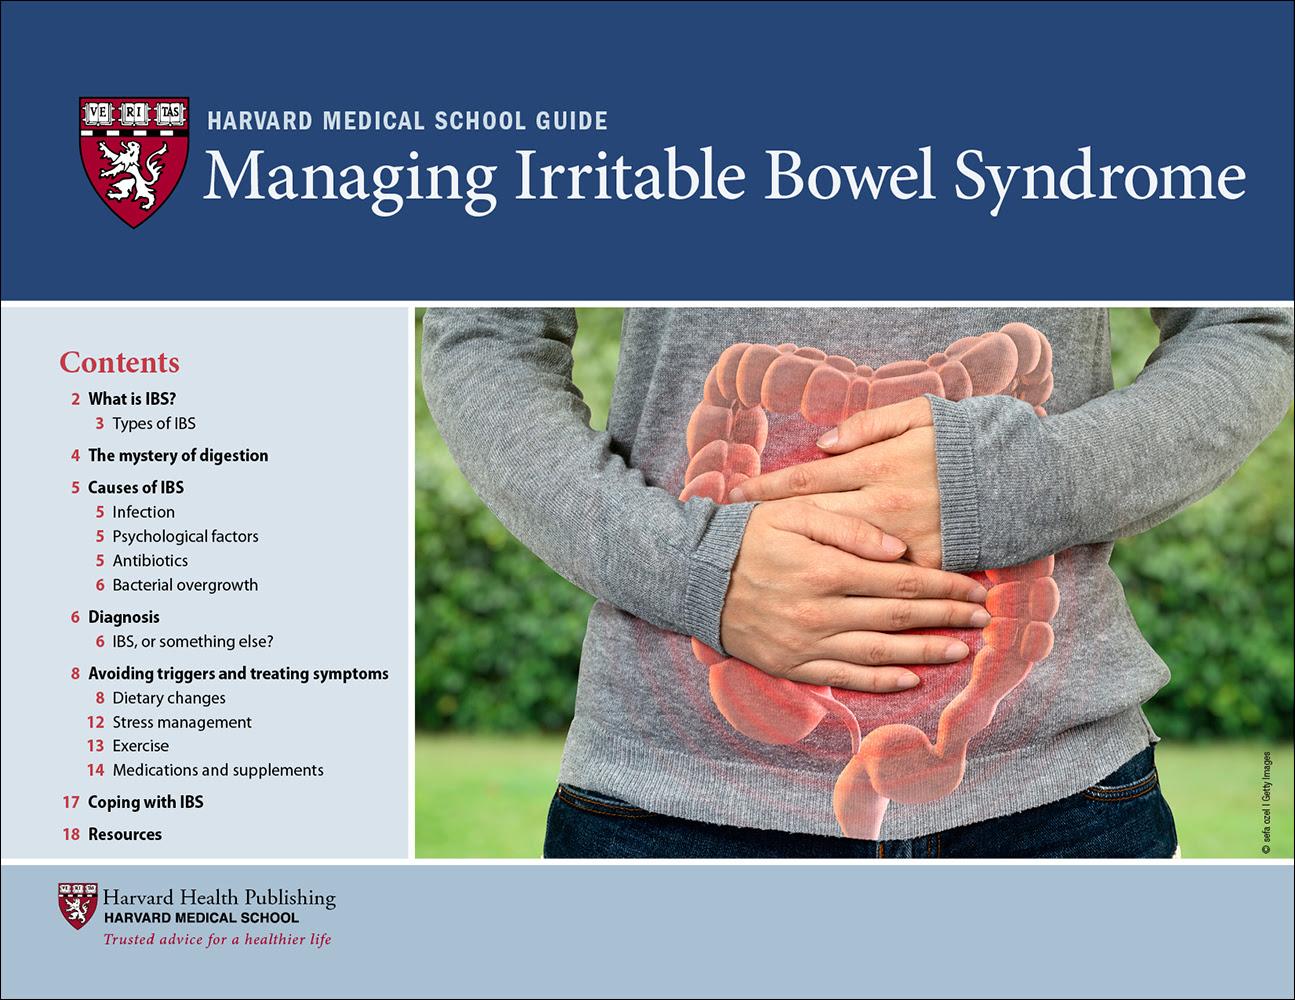 Managing Irritable Bowel Syndrome